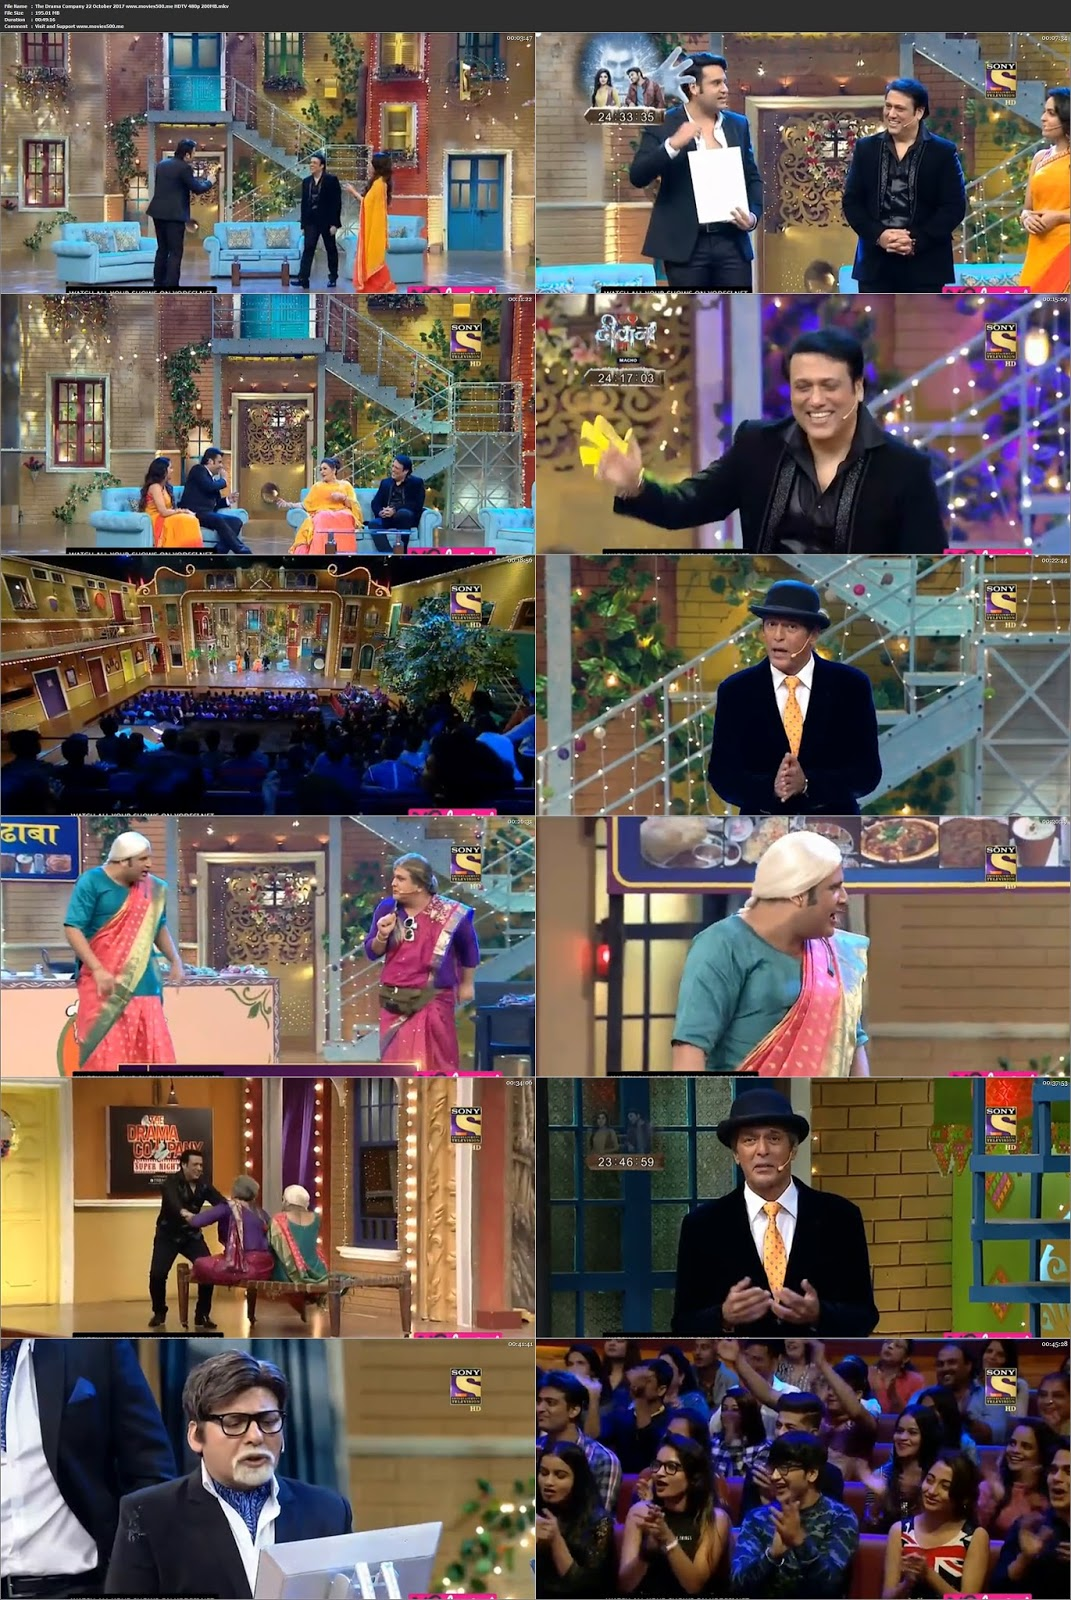 The Drama Company 22 October 2017 Full Show 195MB HDTV 480p at 9966132.com